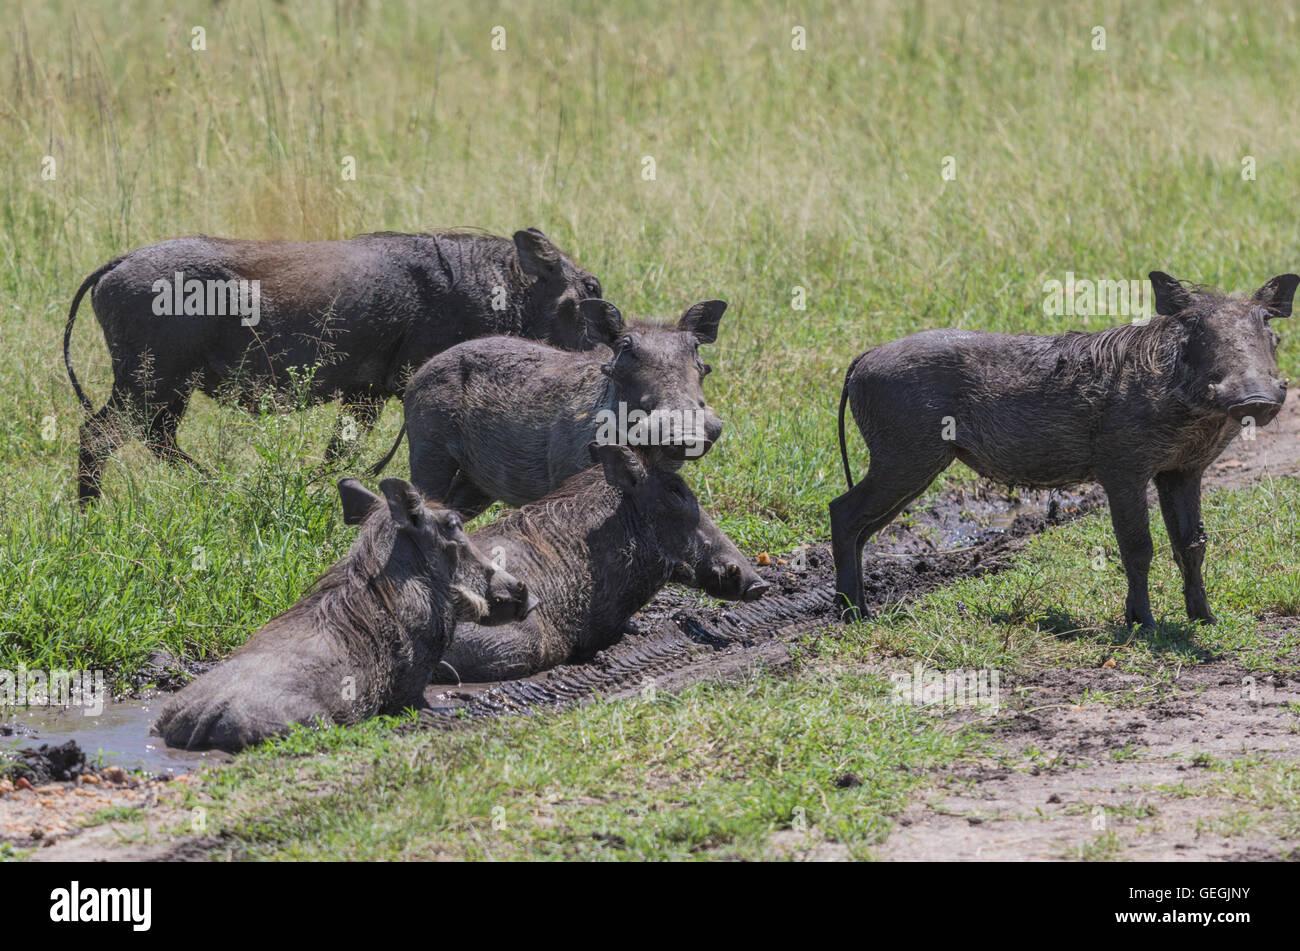 Five wart hogs taking a mud bath on the savanna in Masai Mara, Kenya, Africa - Stock Image